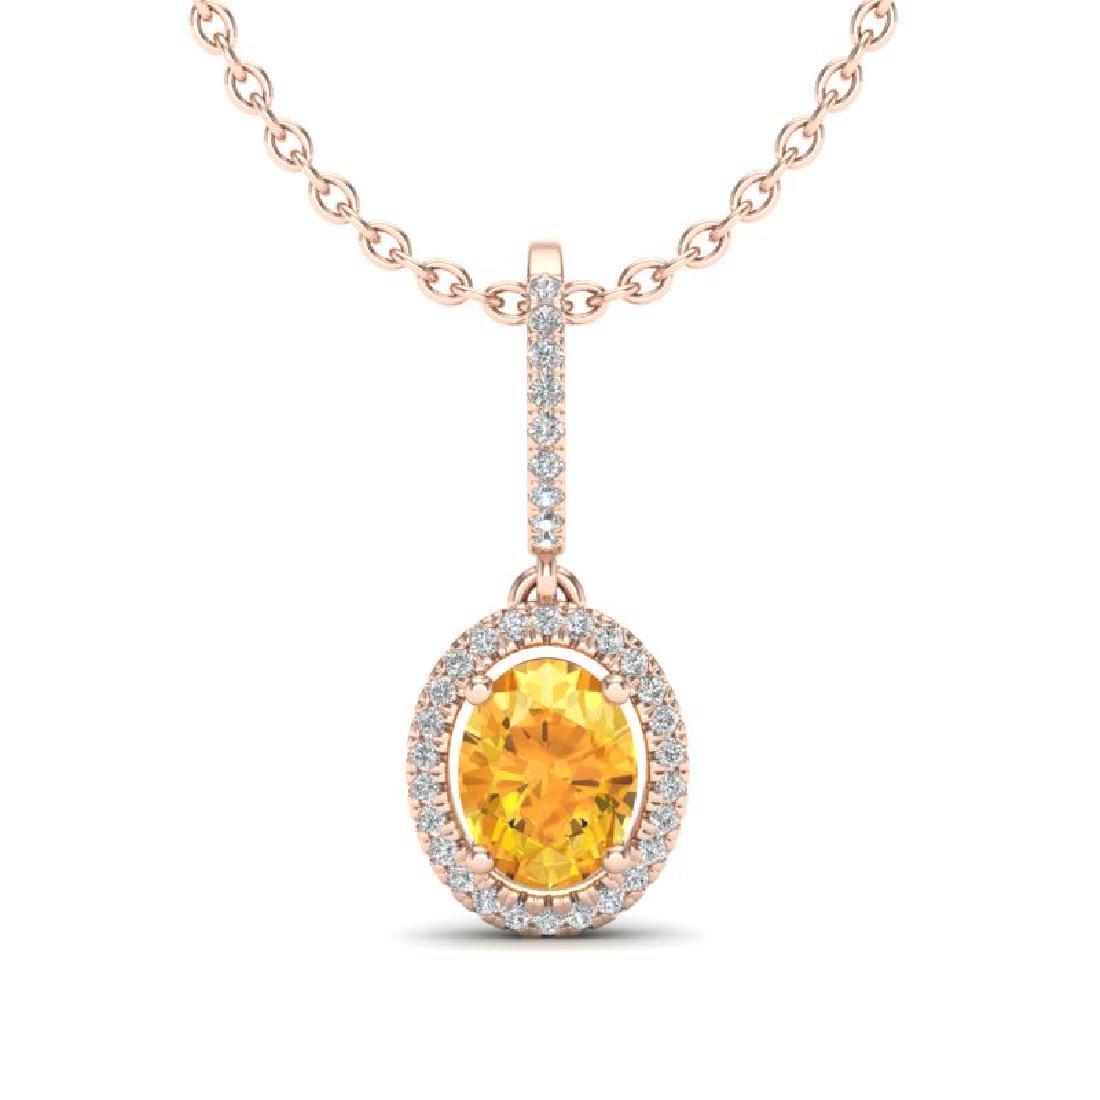 1.75 CTW Citrine & Micro Pave VS/SI Diamond Necklace